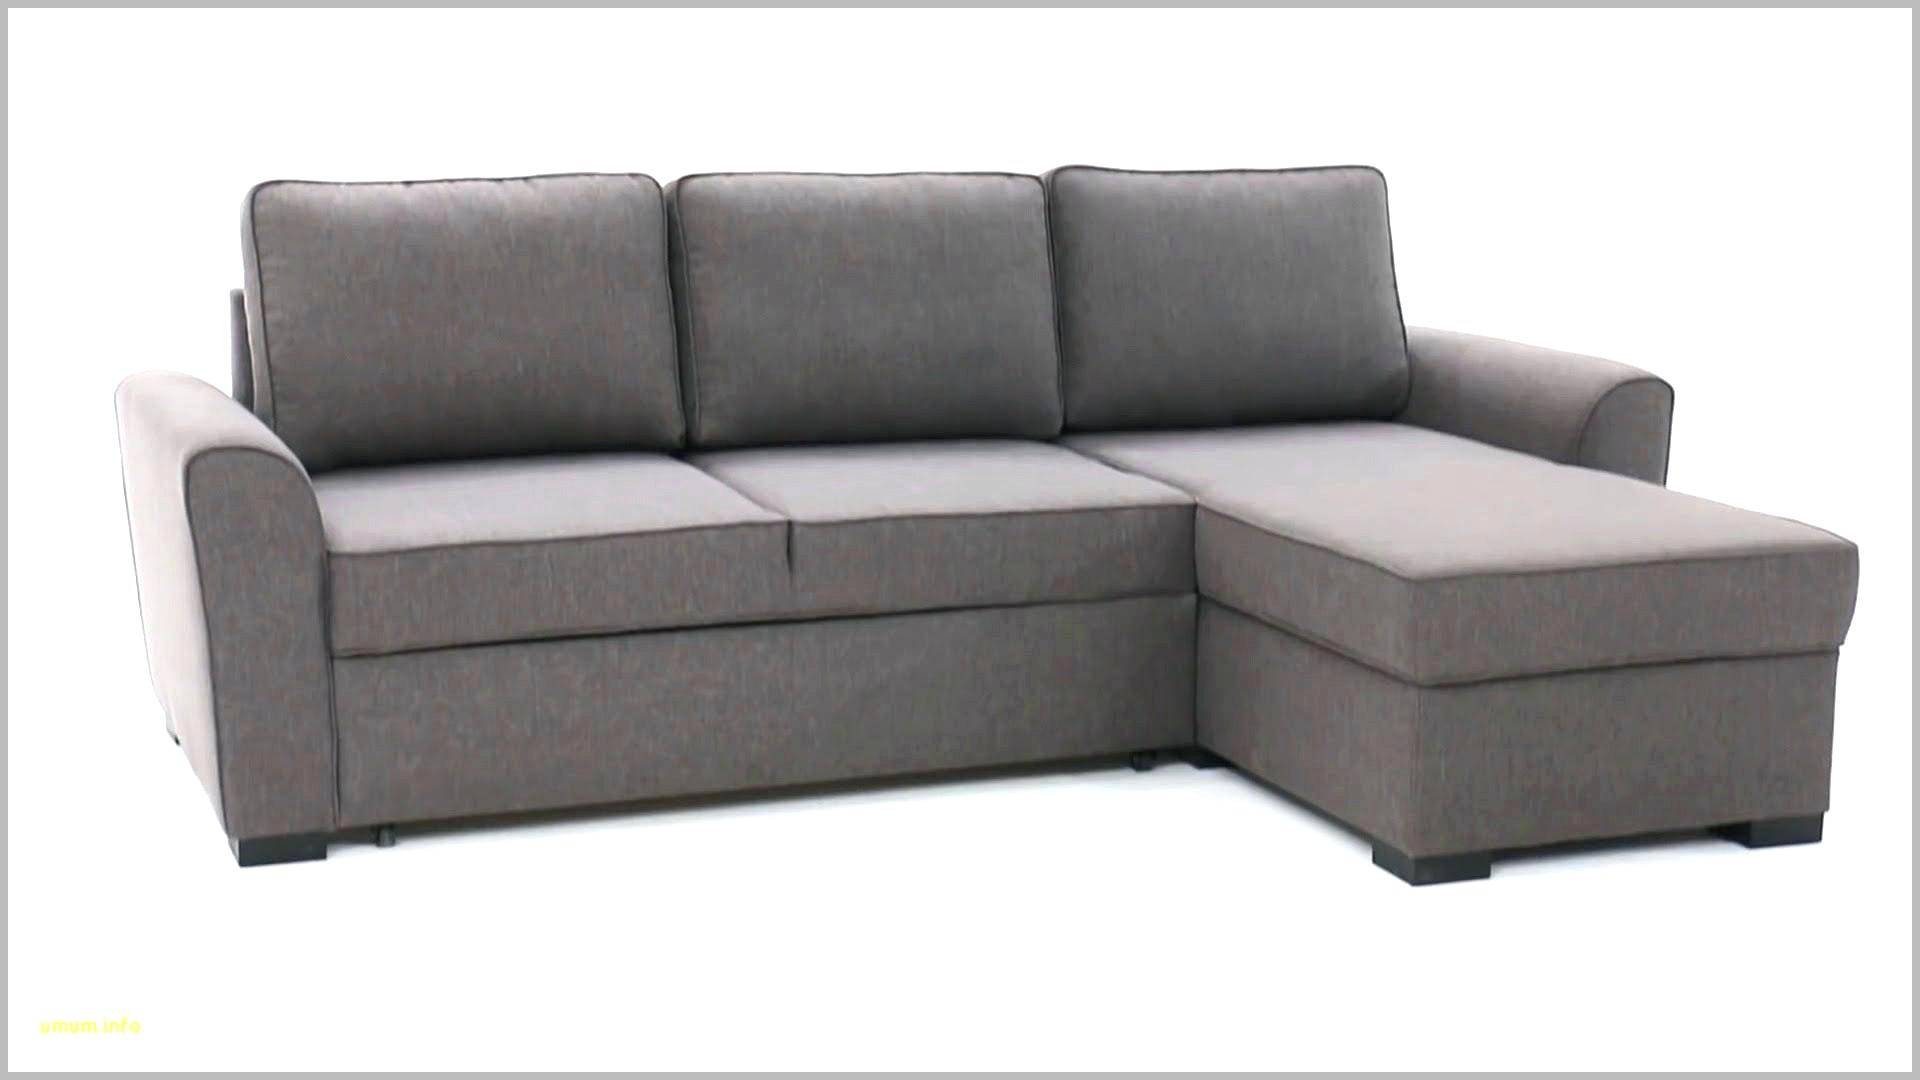 canape cuir ikea kivik awesome kivik housse de canap places avec mridienne gauche with canape. Black Bedroom Furniture Sets. Home Design Ideas